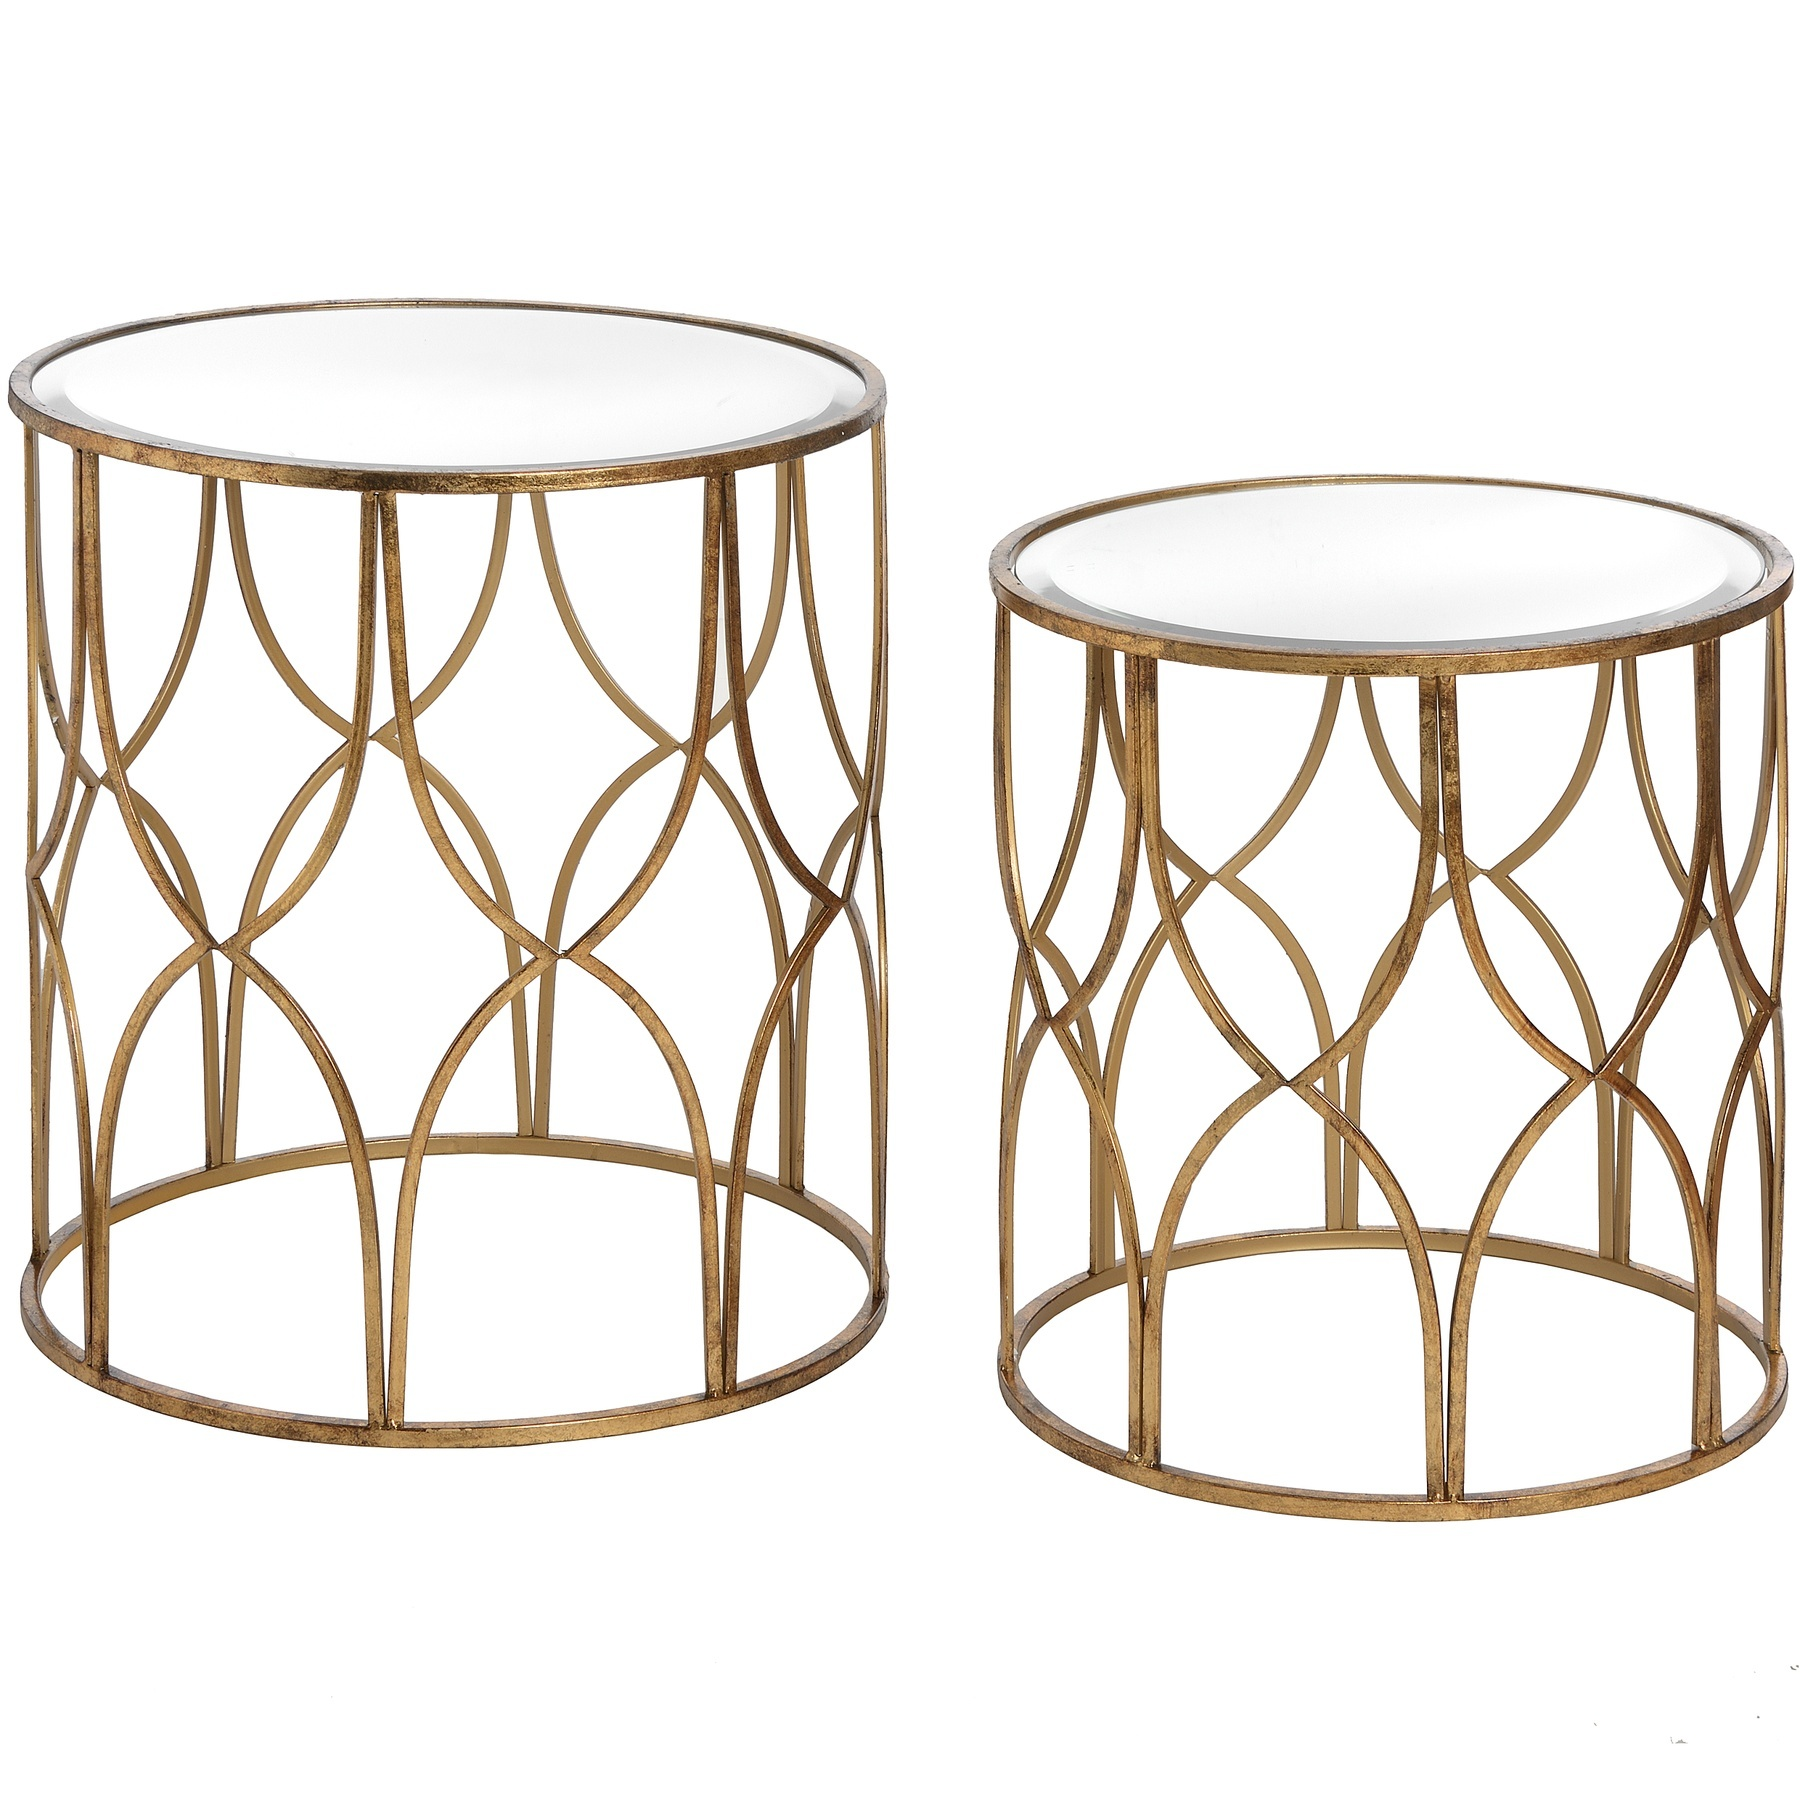 Vintage Styled Gold Lattice Round Set Of 2 Side Tables Nest